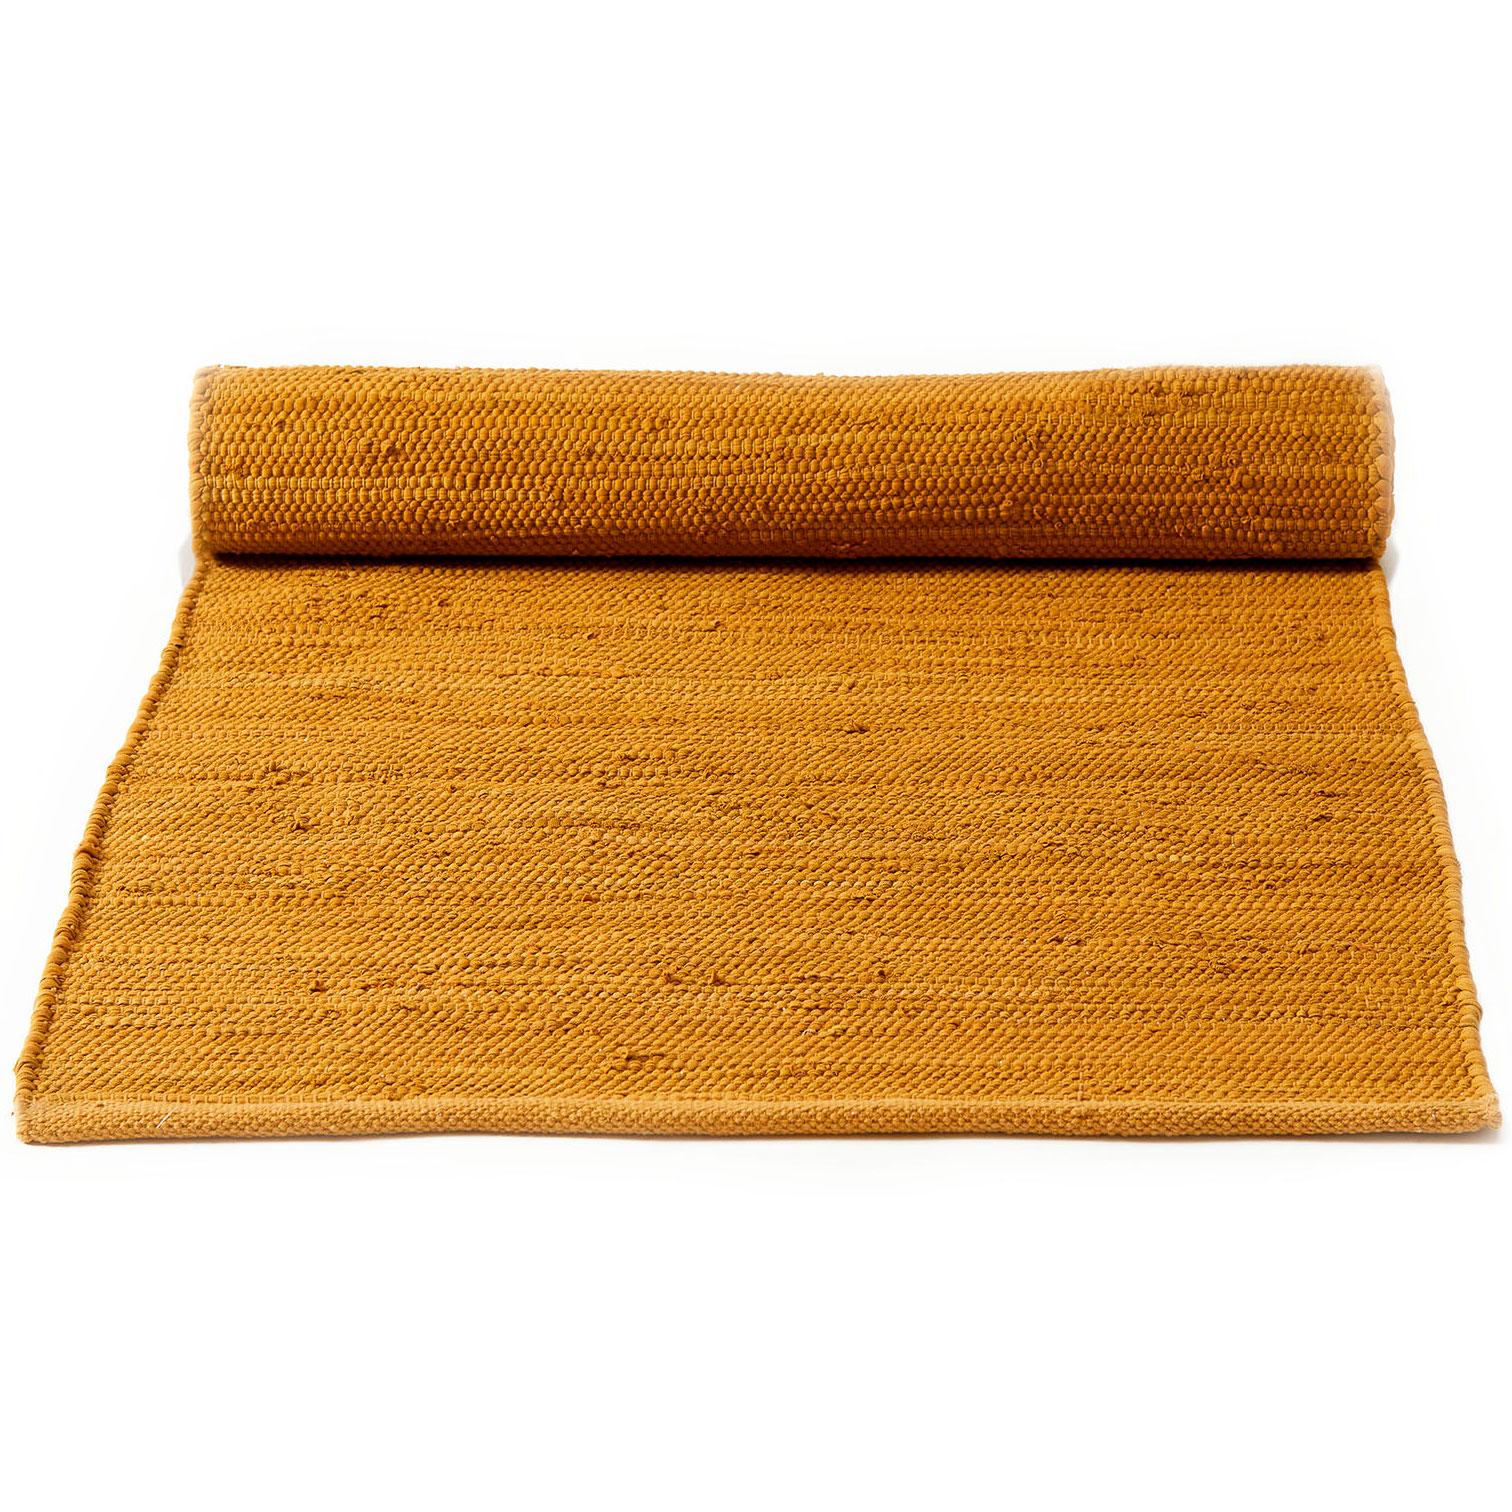 Bilde av Rug Solid-Cotton Gulvteppe 60x90, Burnish Amber